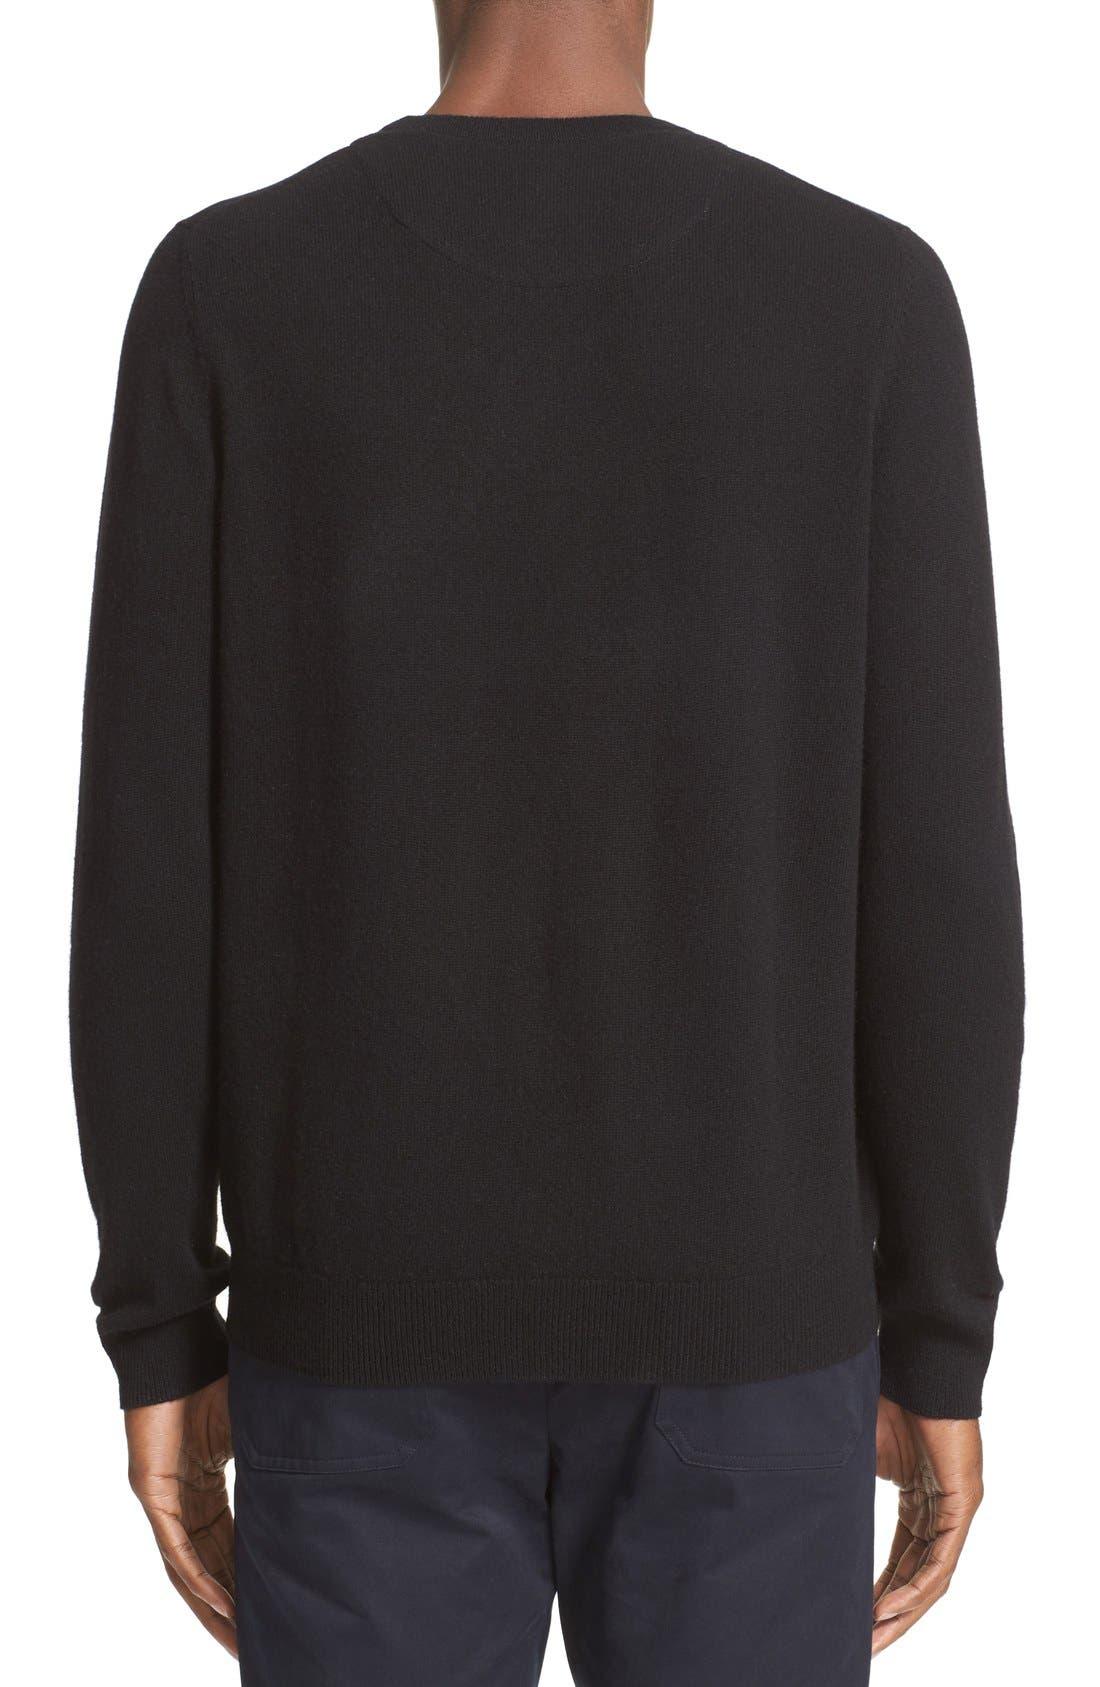 Cashmere Crewneck Sweater,                             Alternate thumbnail 6, color,                             BLACK CAVIAR